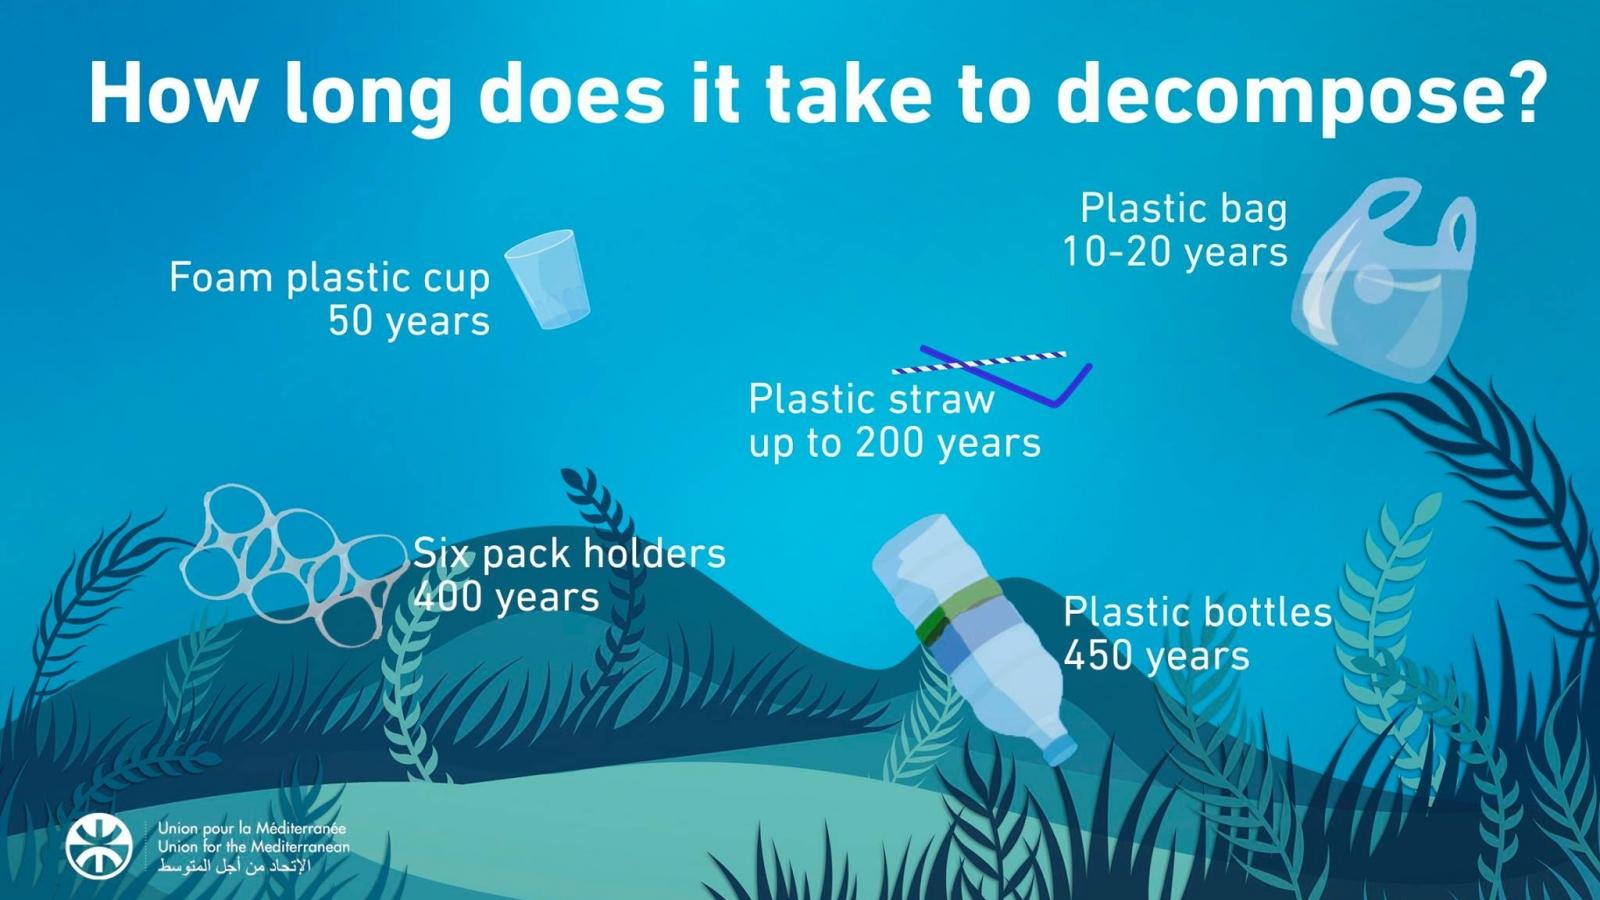 Plastic Decompose.jpg